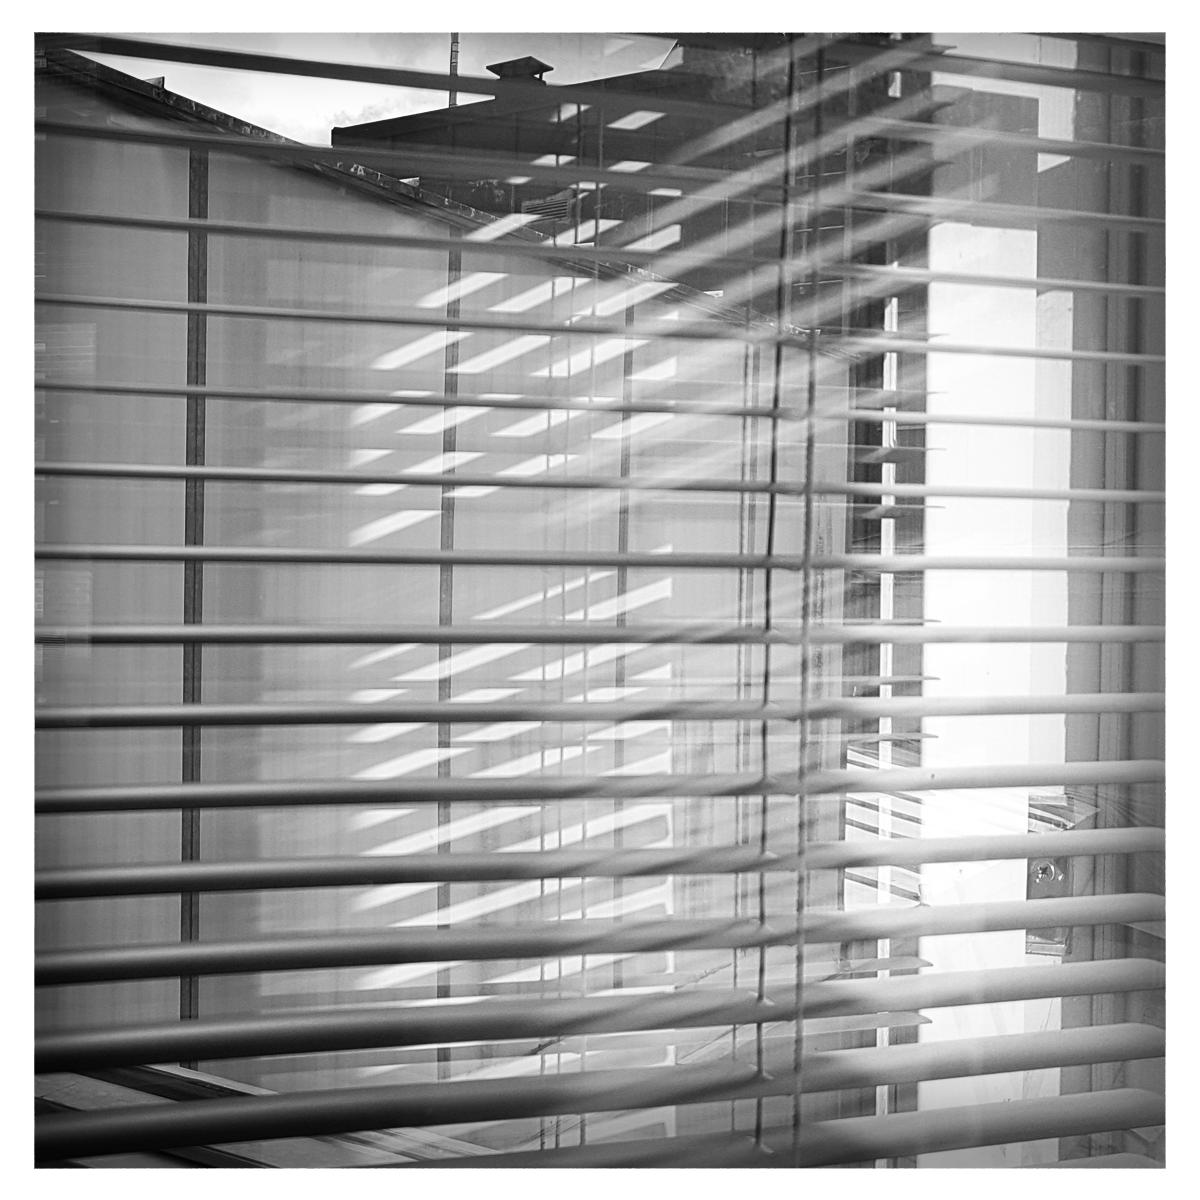 Ikkuna_03